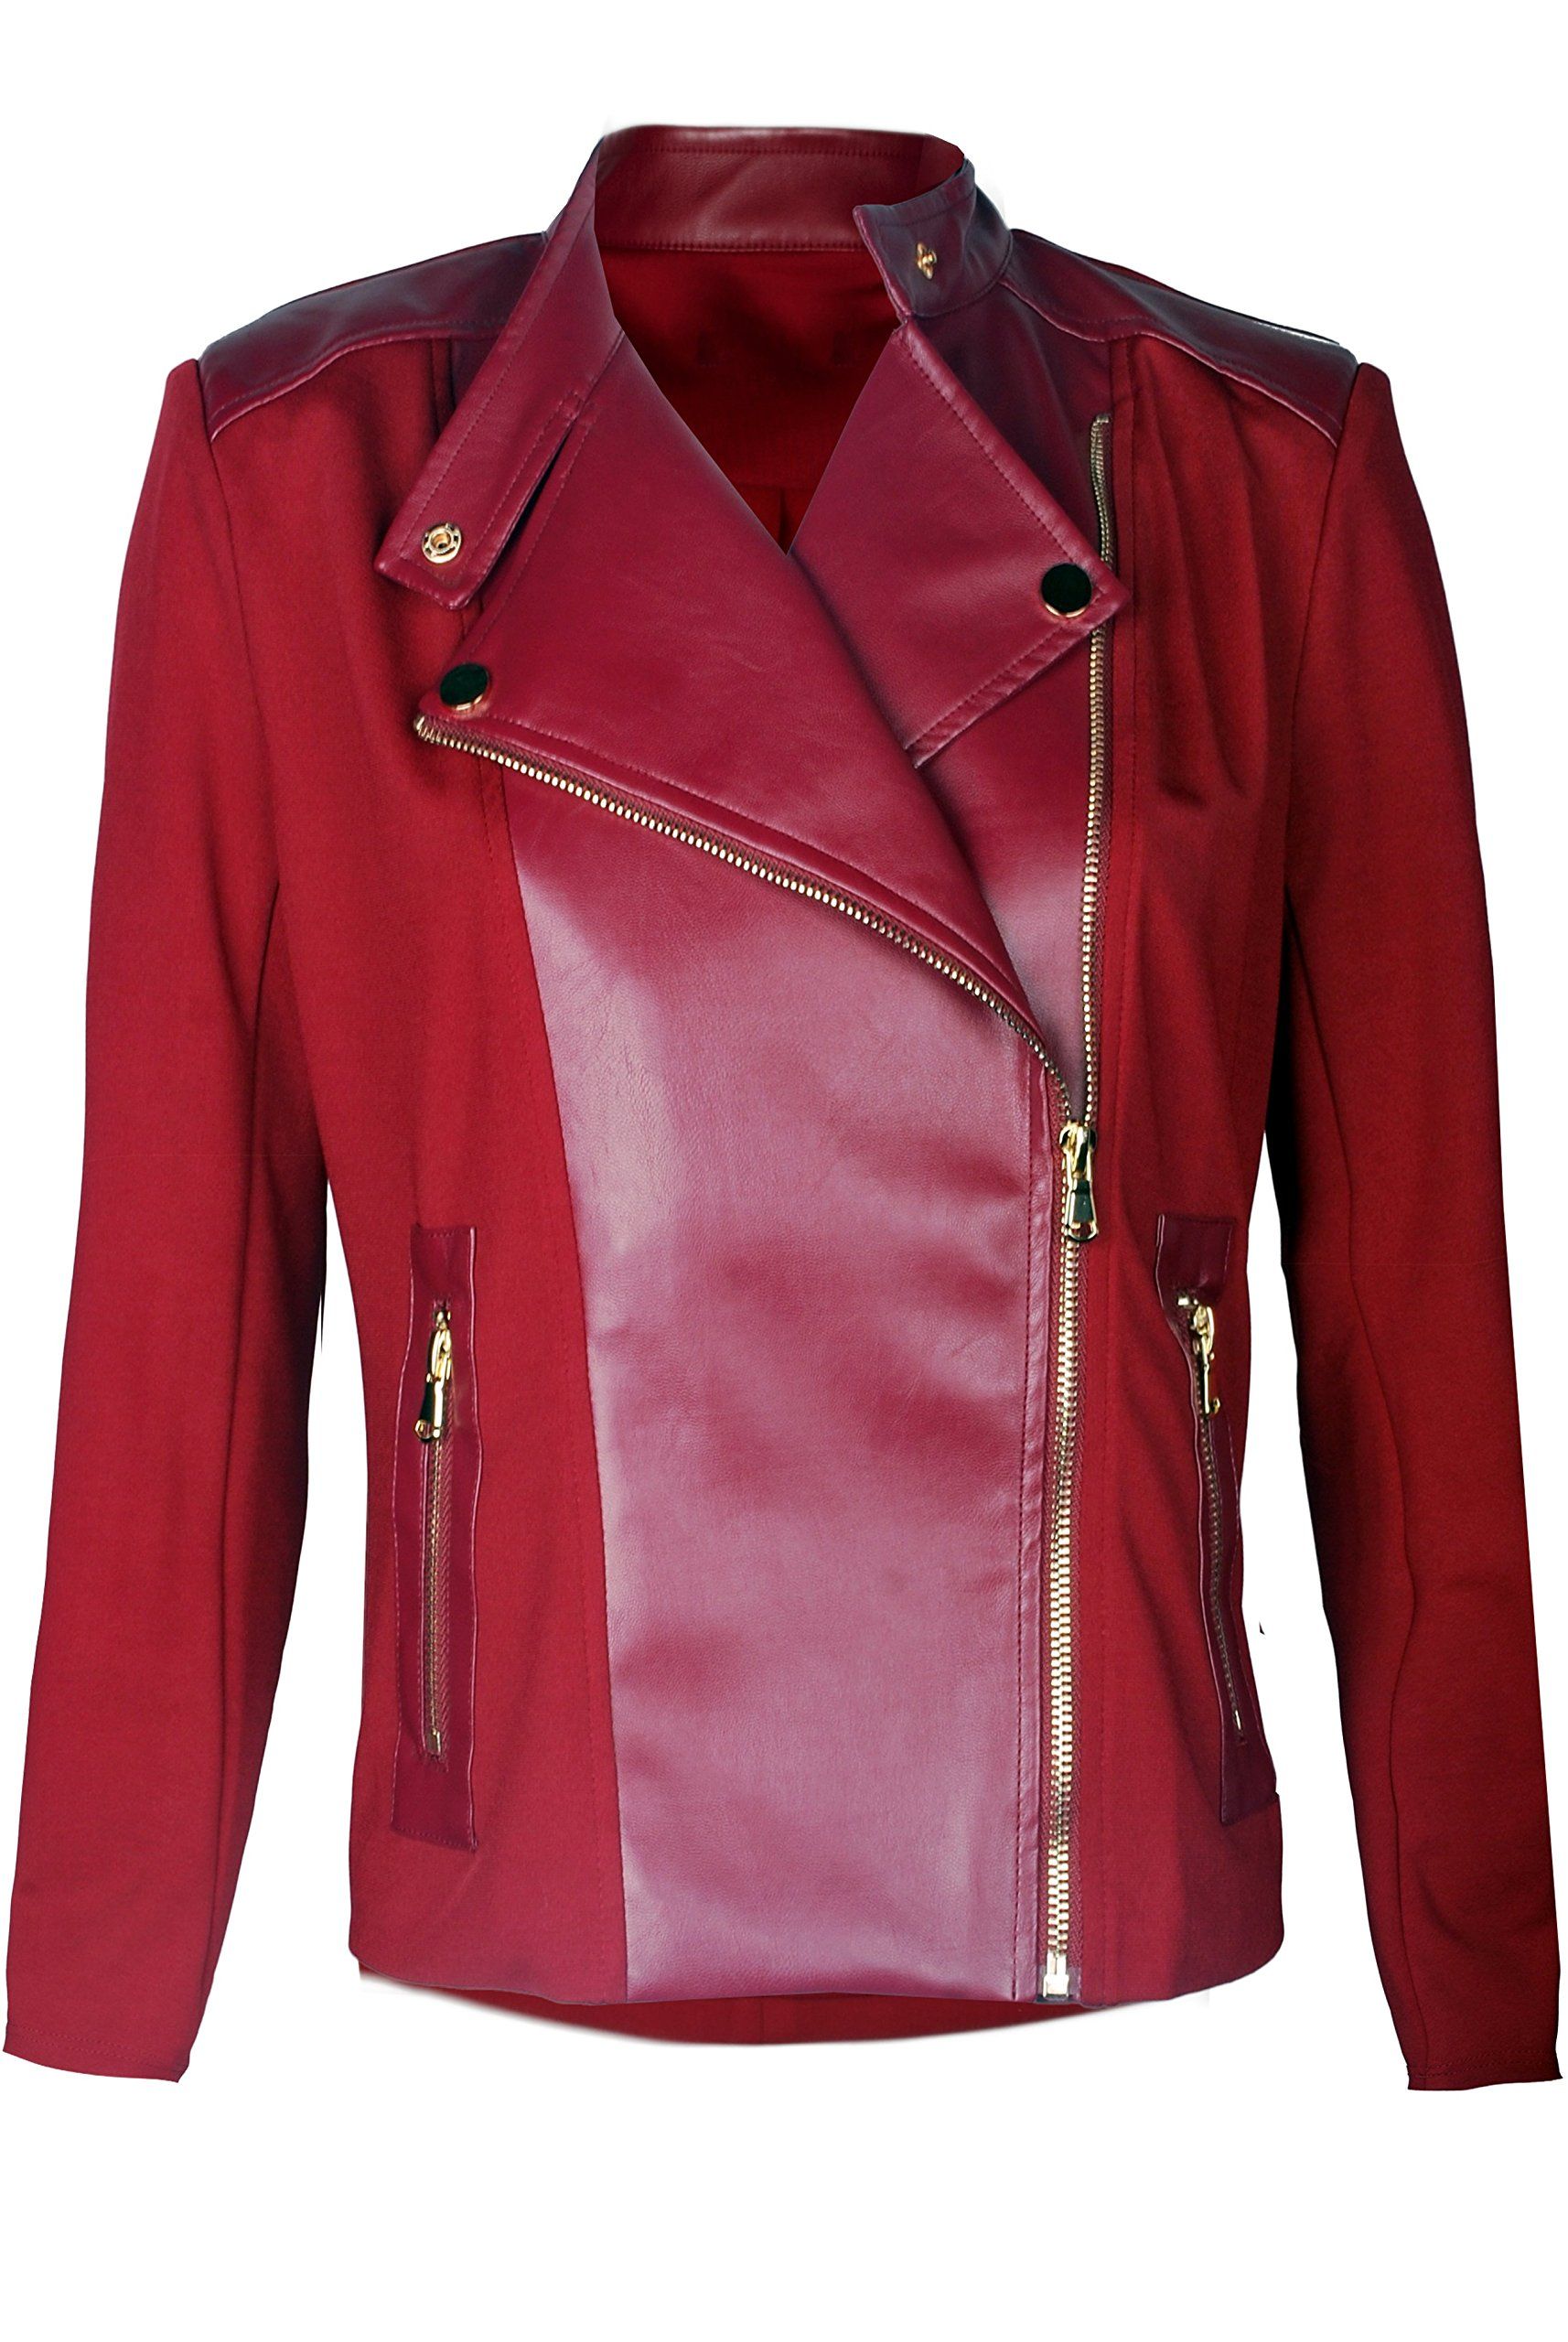 TOP LEGGING TL Women's Classic Zip Up Faux Leather Moto Biker Jacket In Multiple Styles 754_Burgundy L